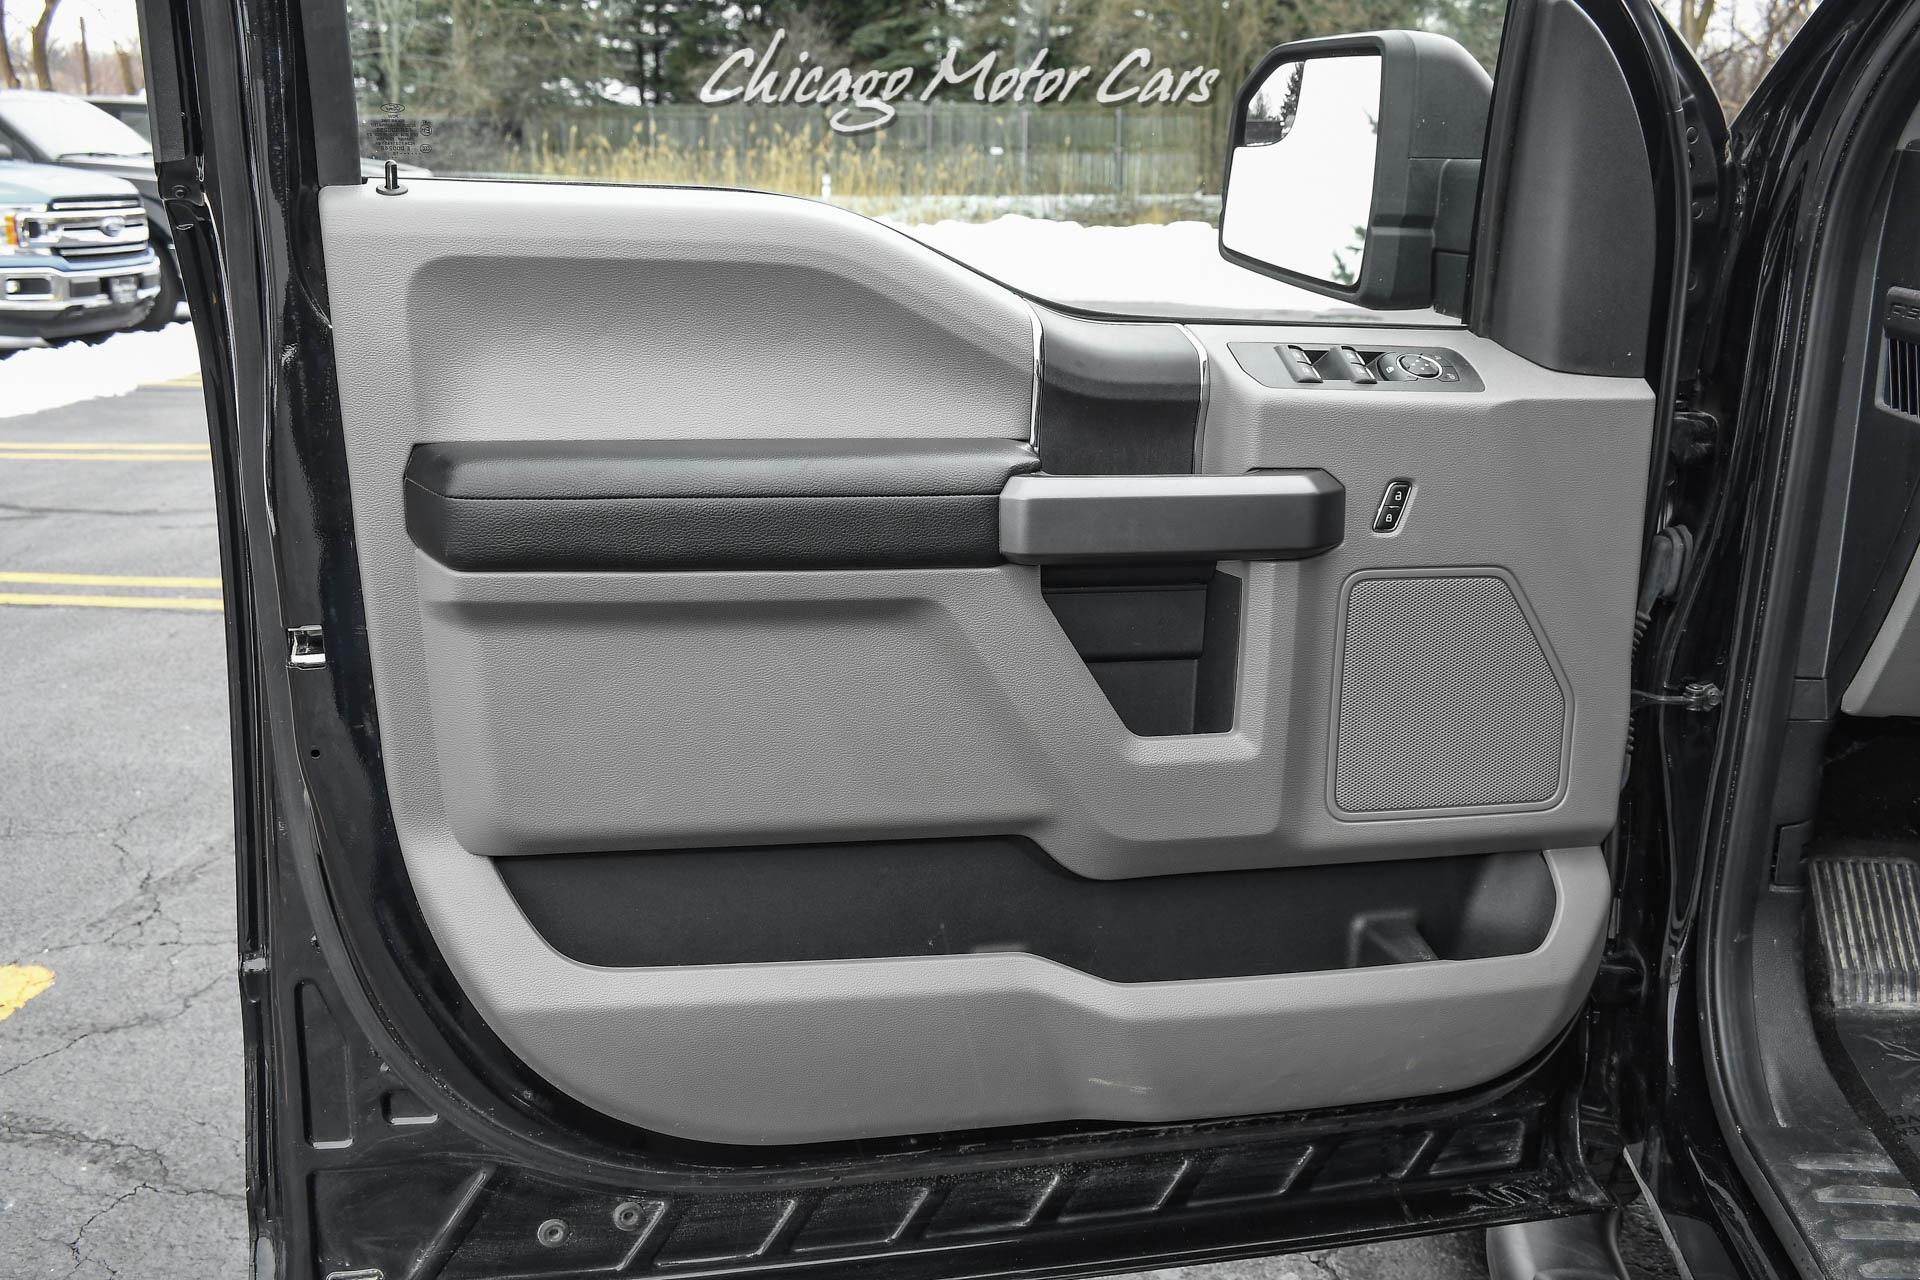 Used-2019-Ford-F-150-XLT-4x4-SuperCrew-Pickup-50L-V8-SB-Black-21k-Miles-F150